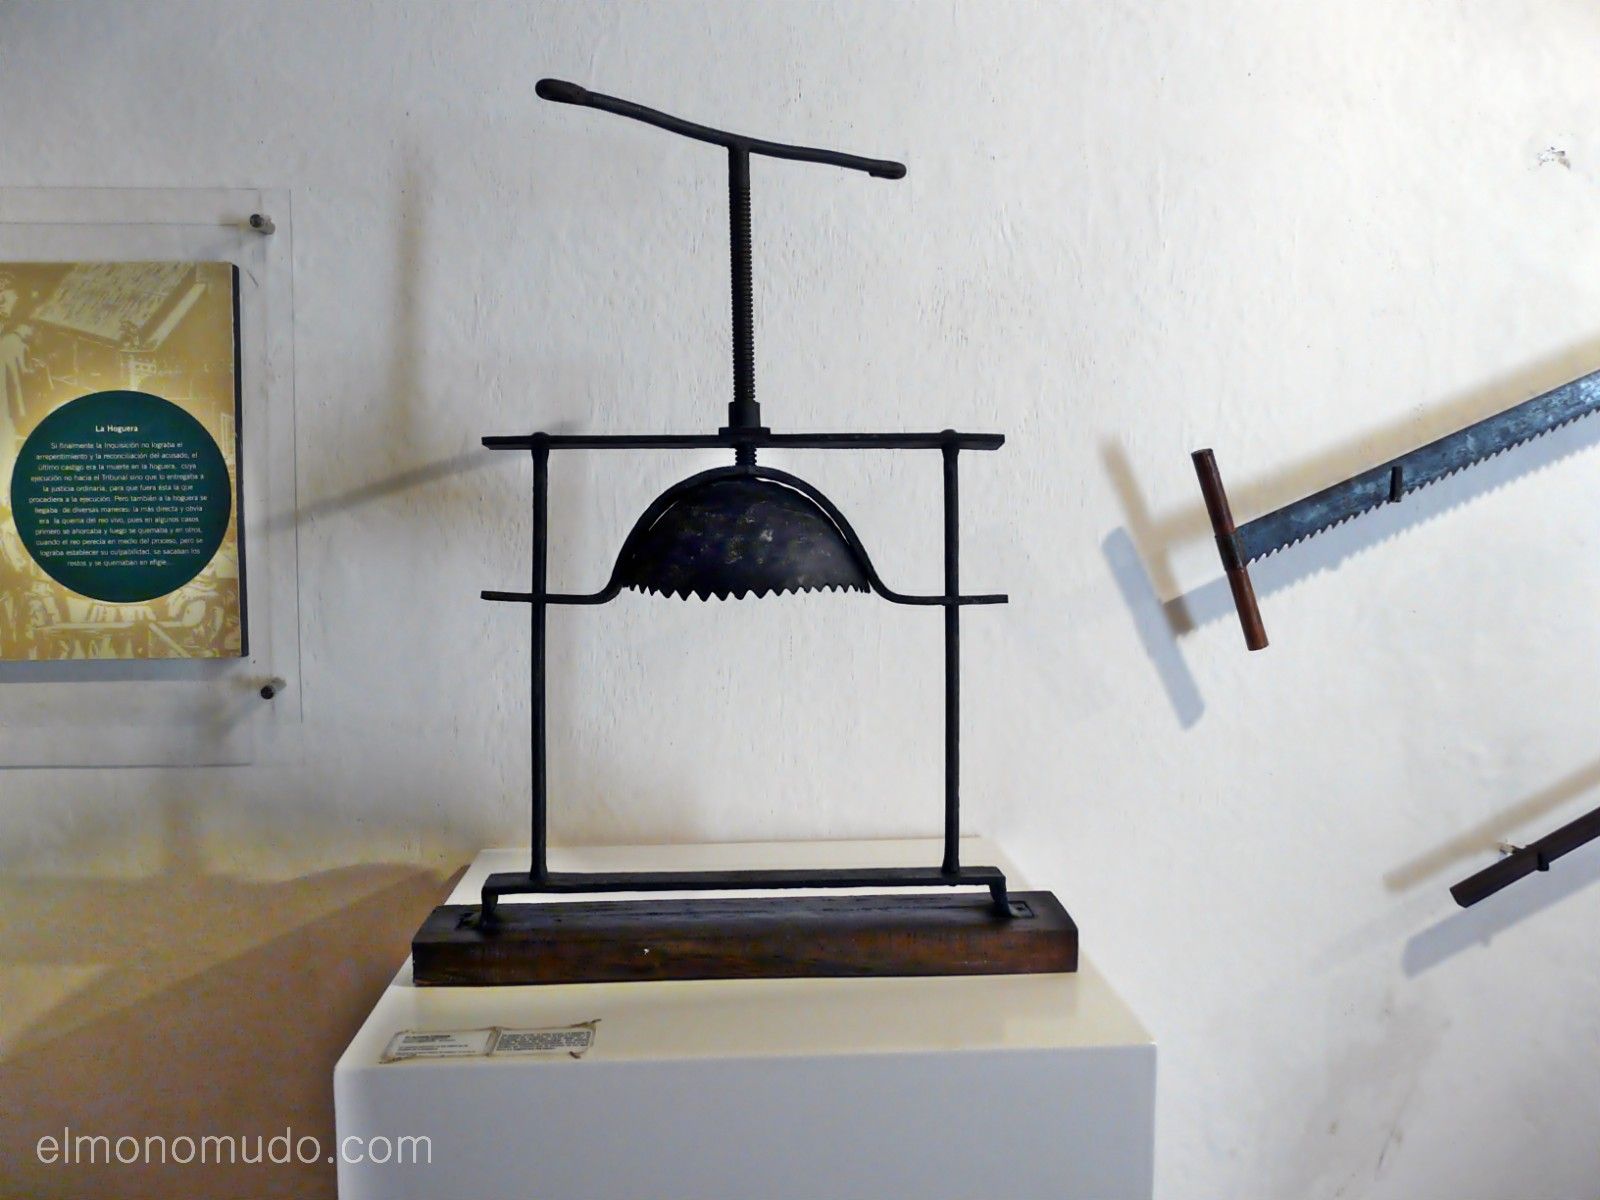 Instrumentos  de tortura reales P1080579-1600x1200